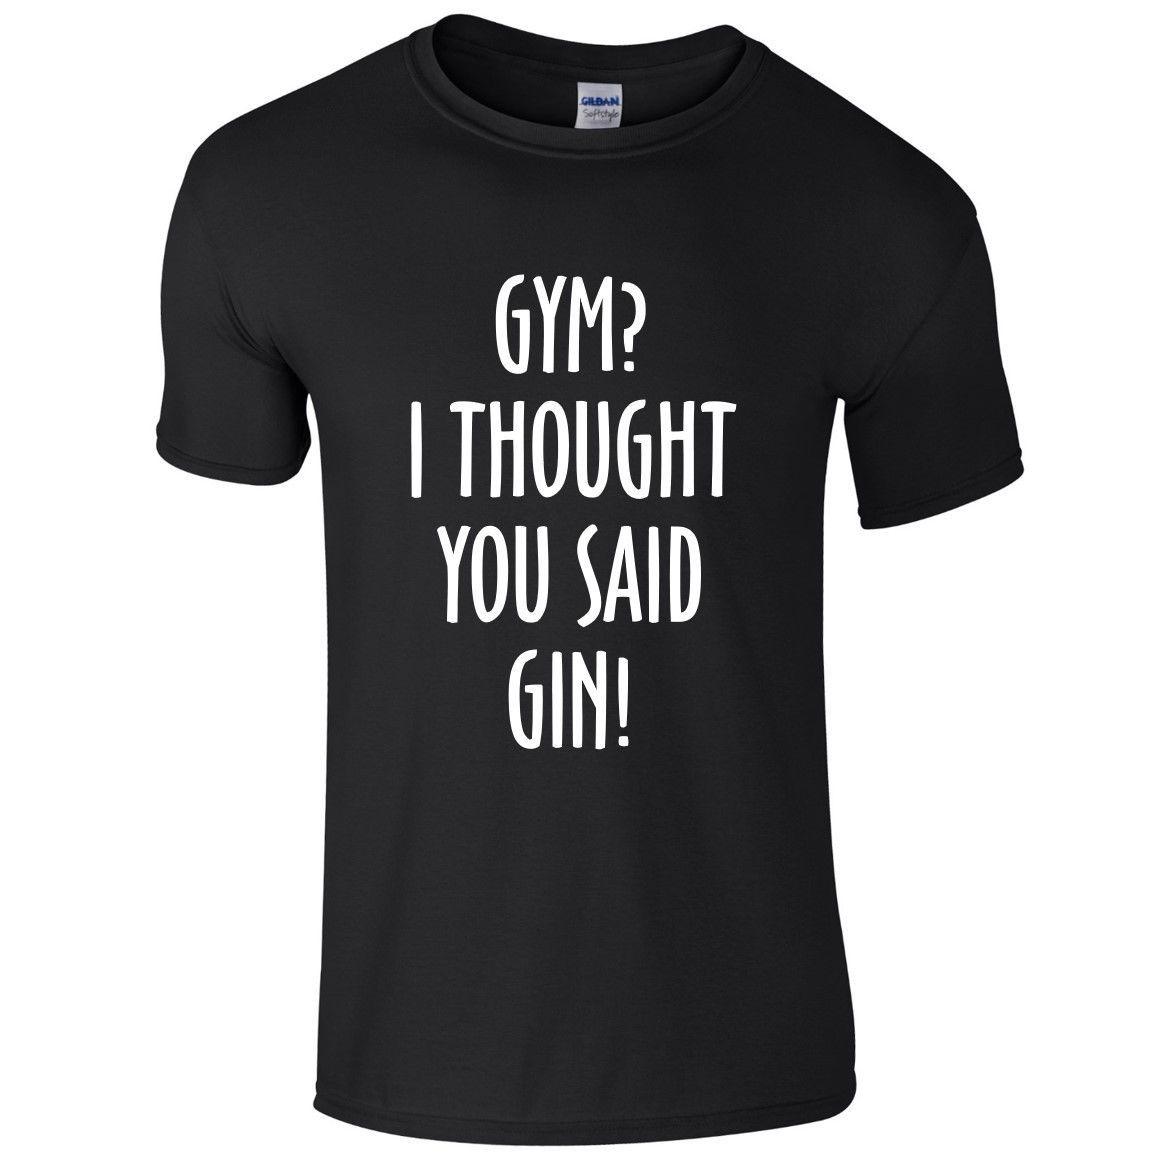 0fa8fbc67 Mens T Shirt S 3XL Grappig Gedrukt Joke Top Alcohol Harajuku Cool T Shirt  Homme Online Funky T Shirts Buy T Shirt Design From Dorker, ...